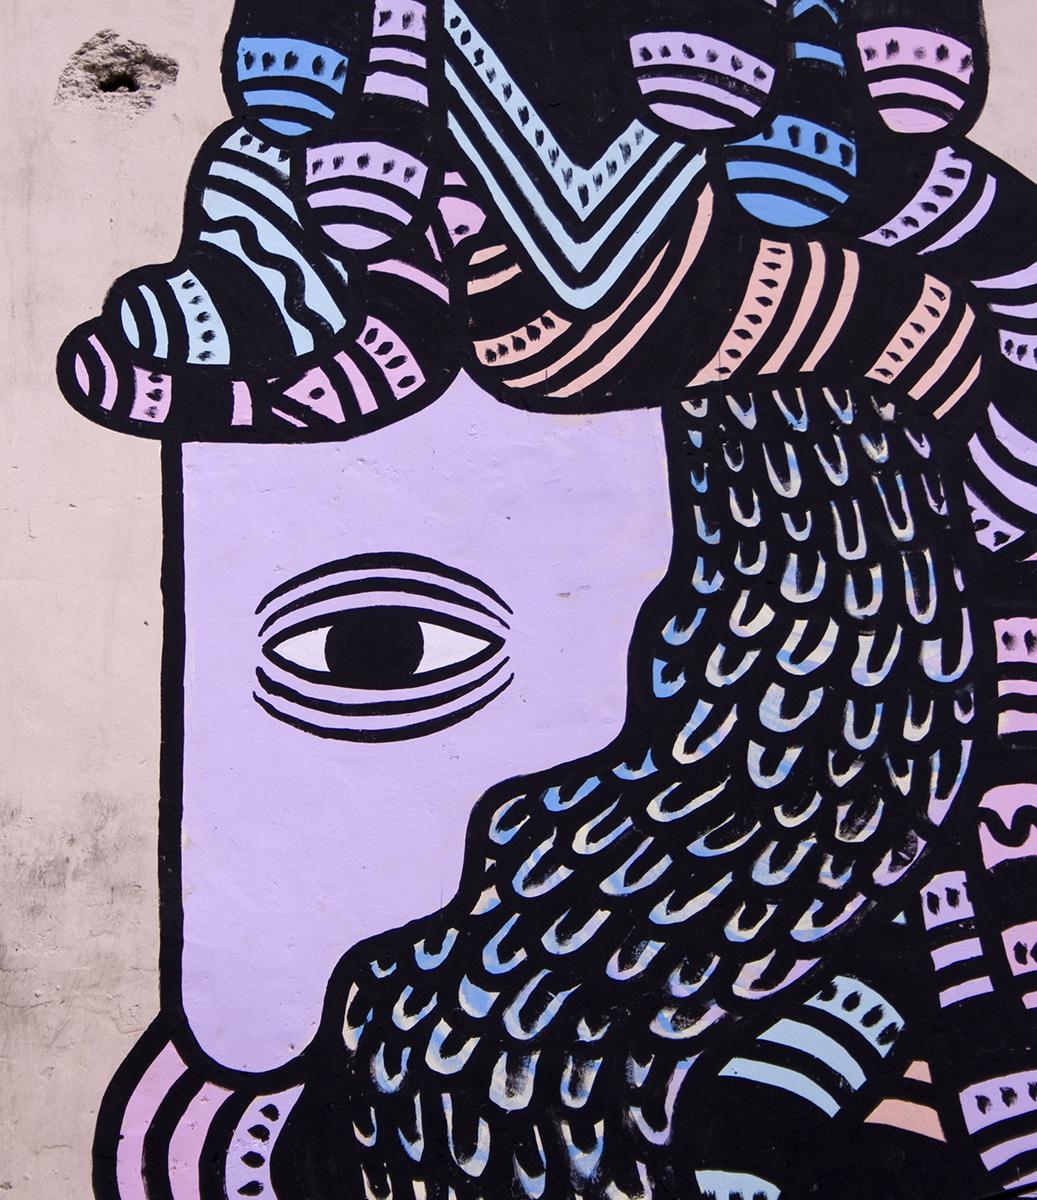 mattia-lullini-new-mural-for-st-art-delhi-festival-06